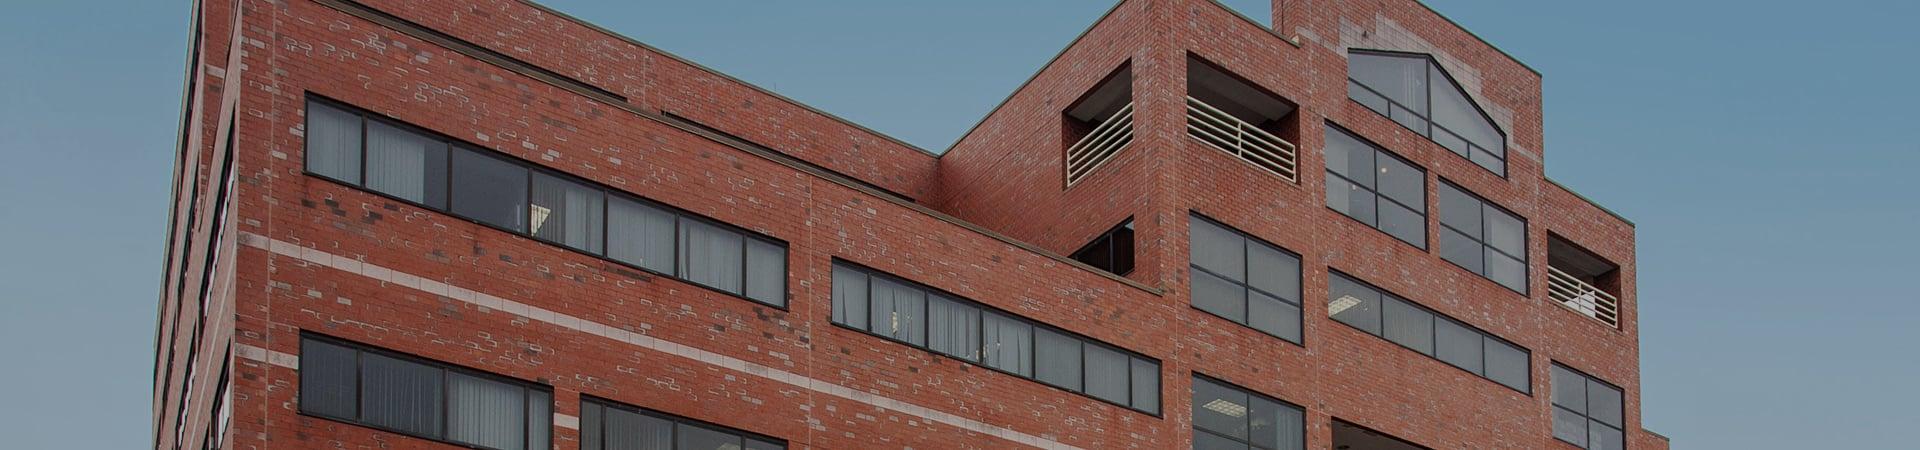 gbu-locations-framingham-1920x450